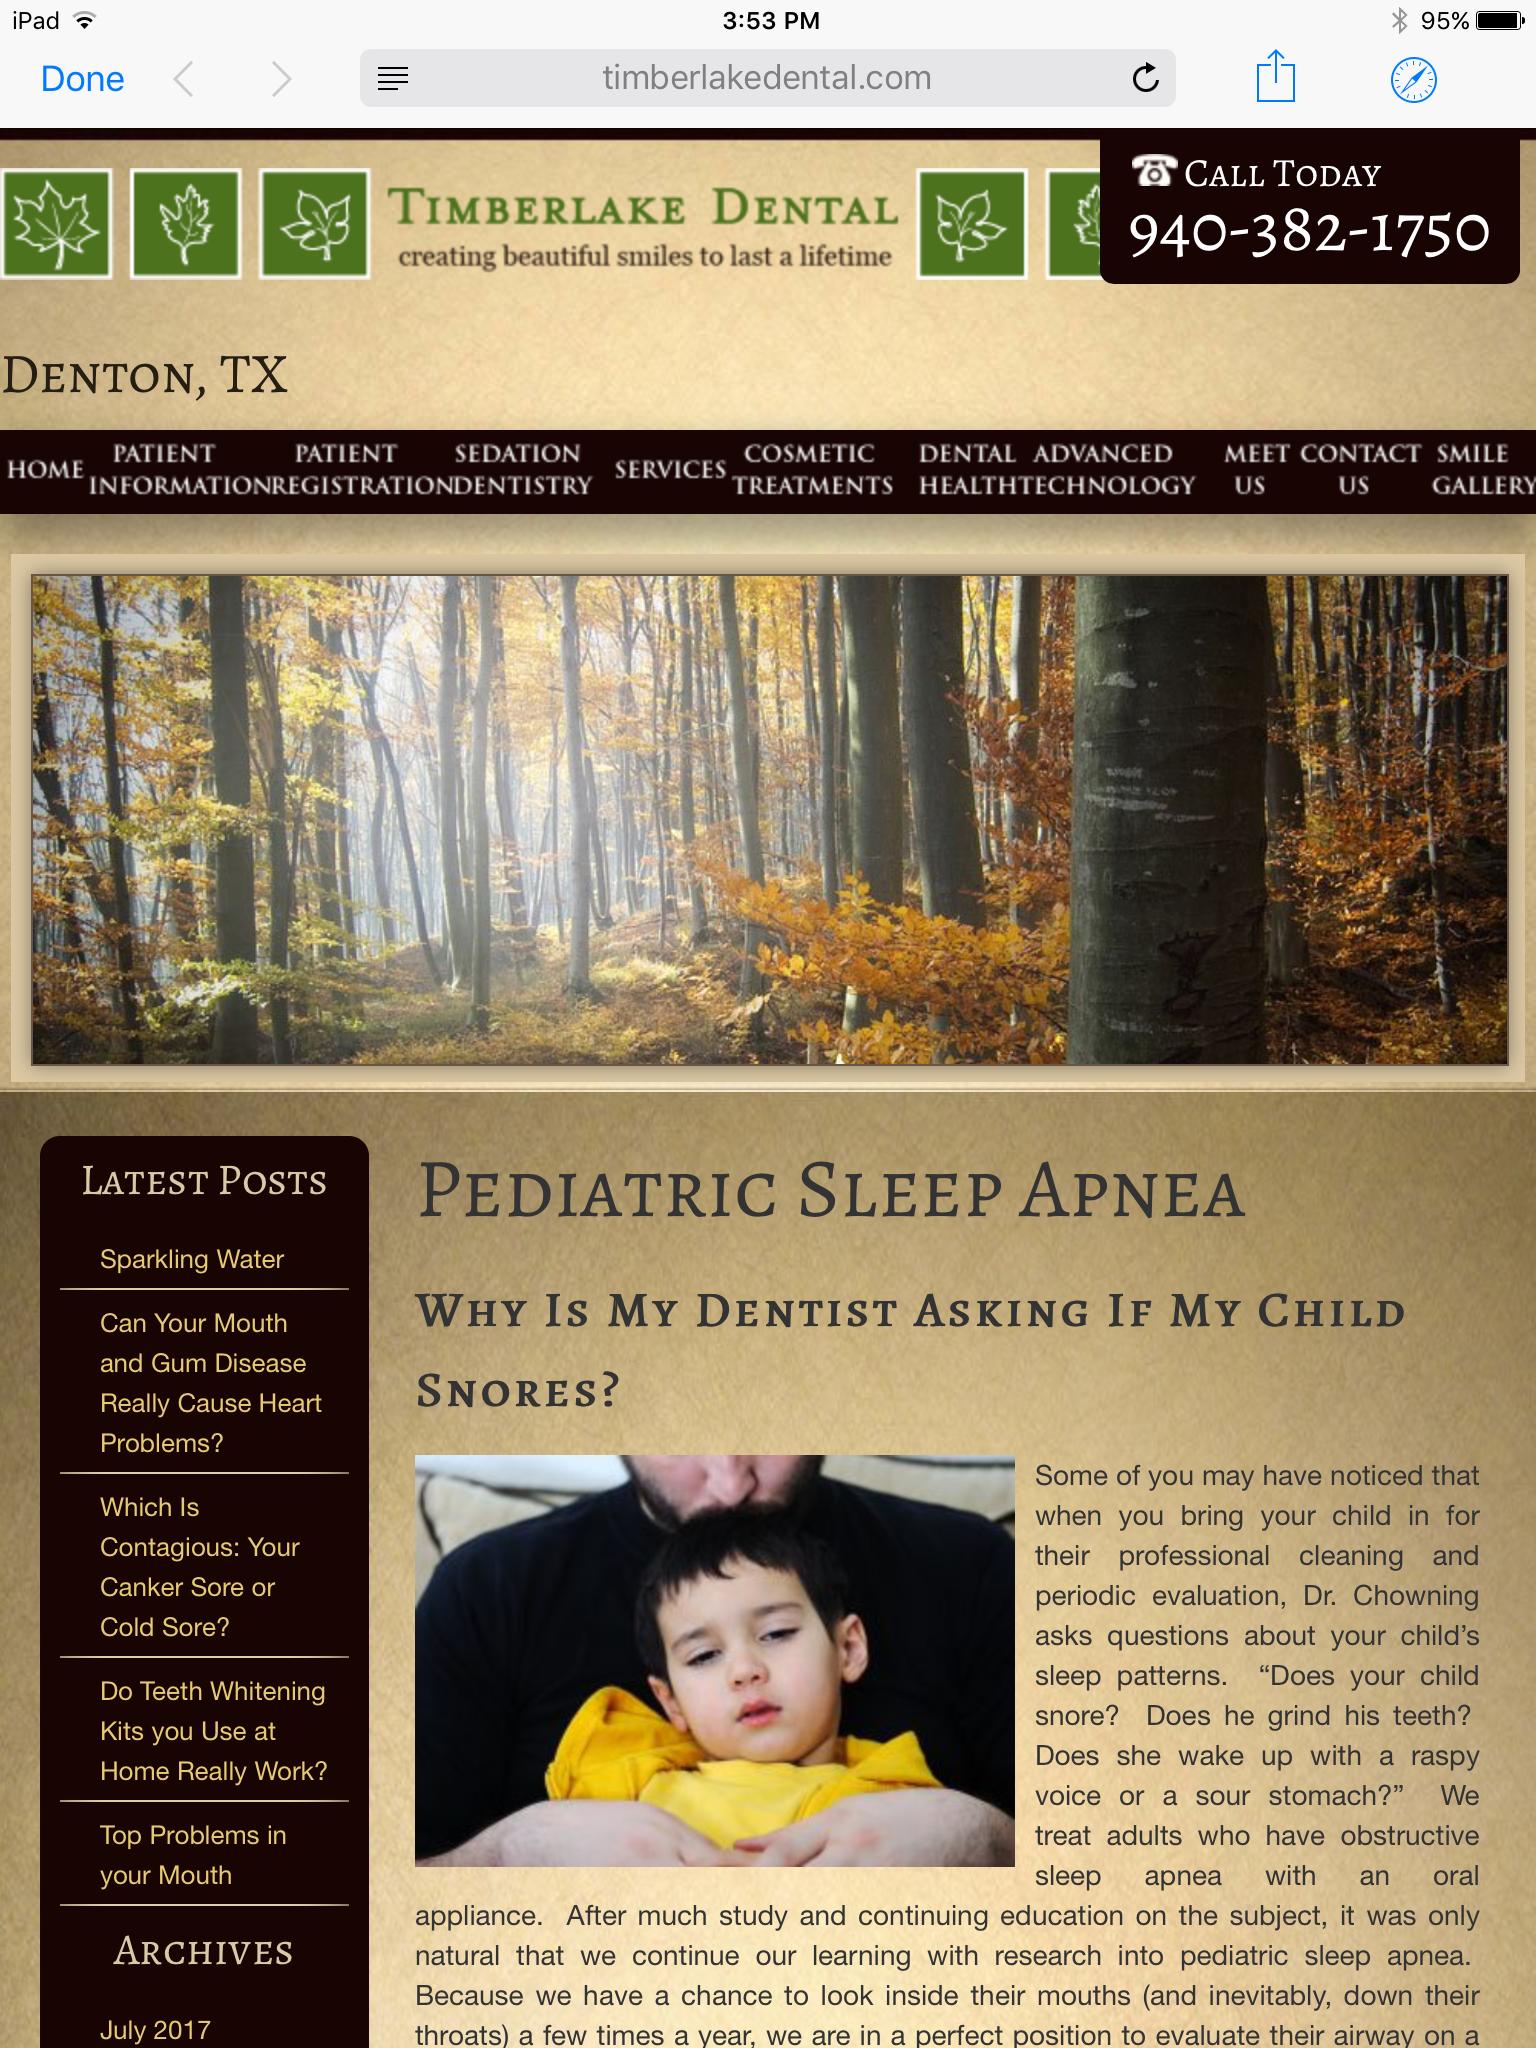 Pediatric Sleep Apnea | Patient Education Blog by Timberlake